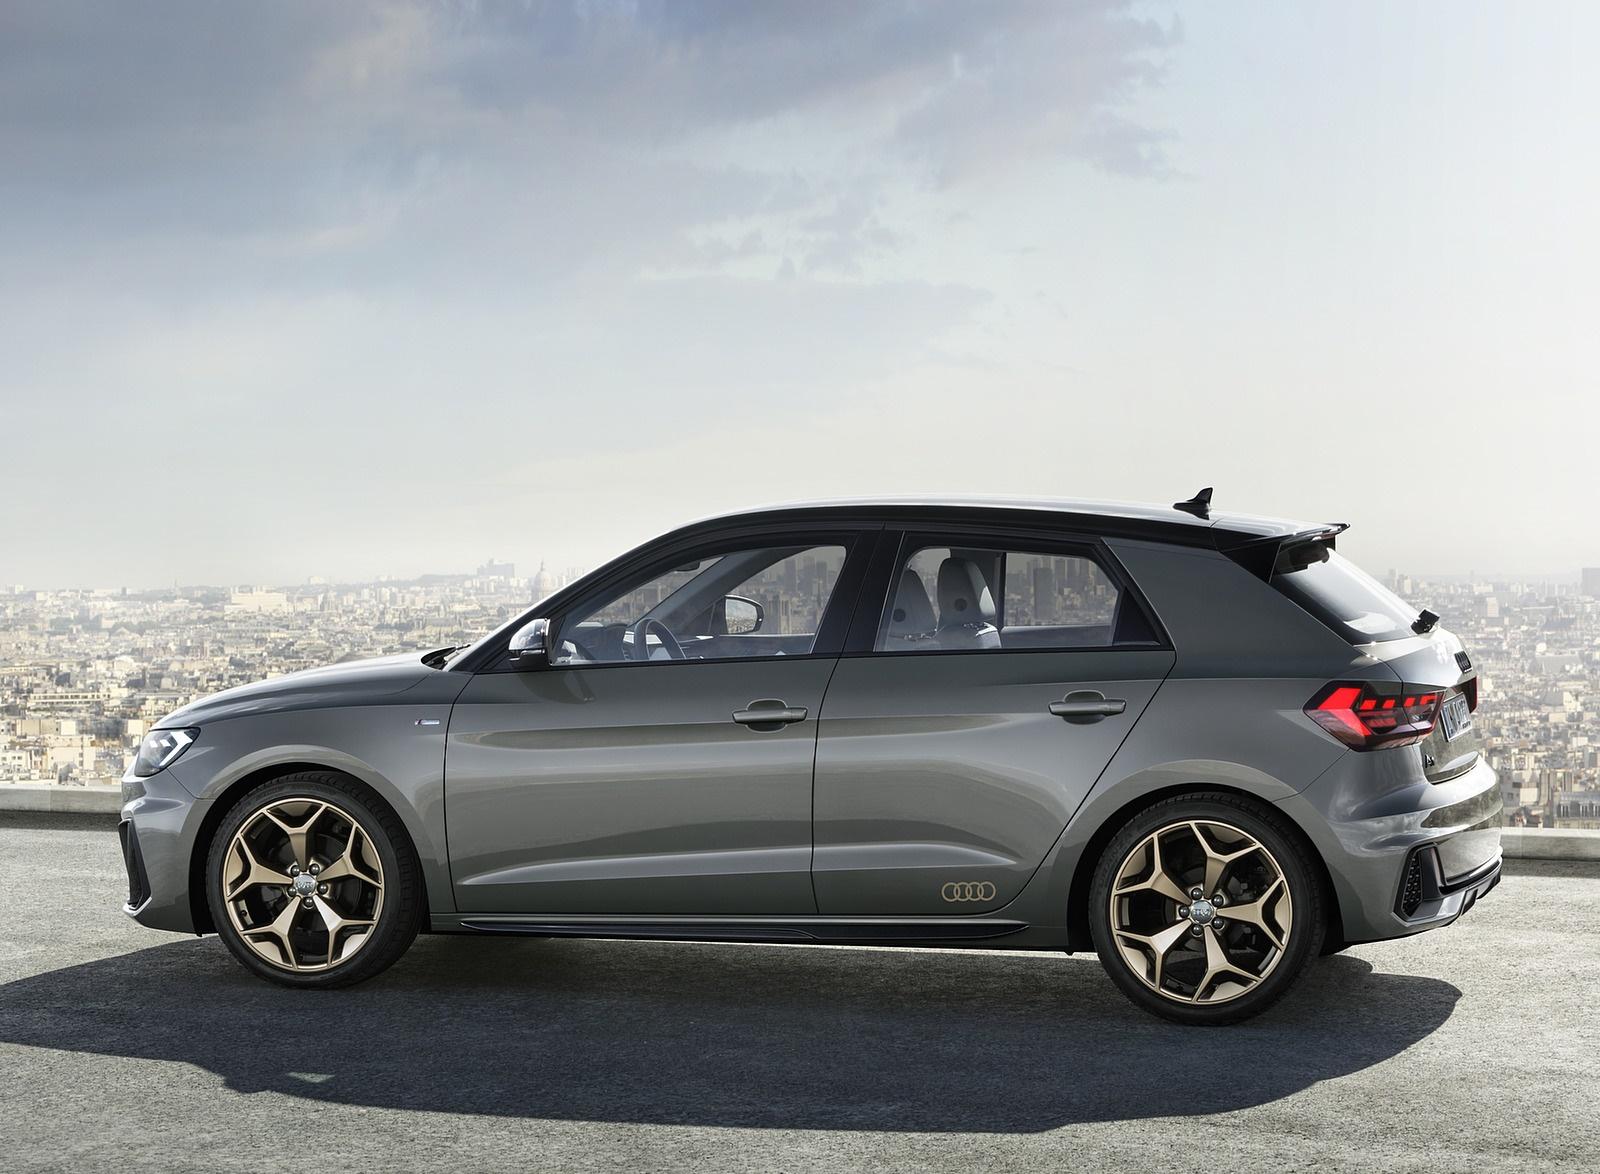 2019 Audi A1 Sportback (Color: Chronos Grey) Side Wallpapers (6)